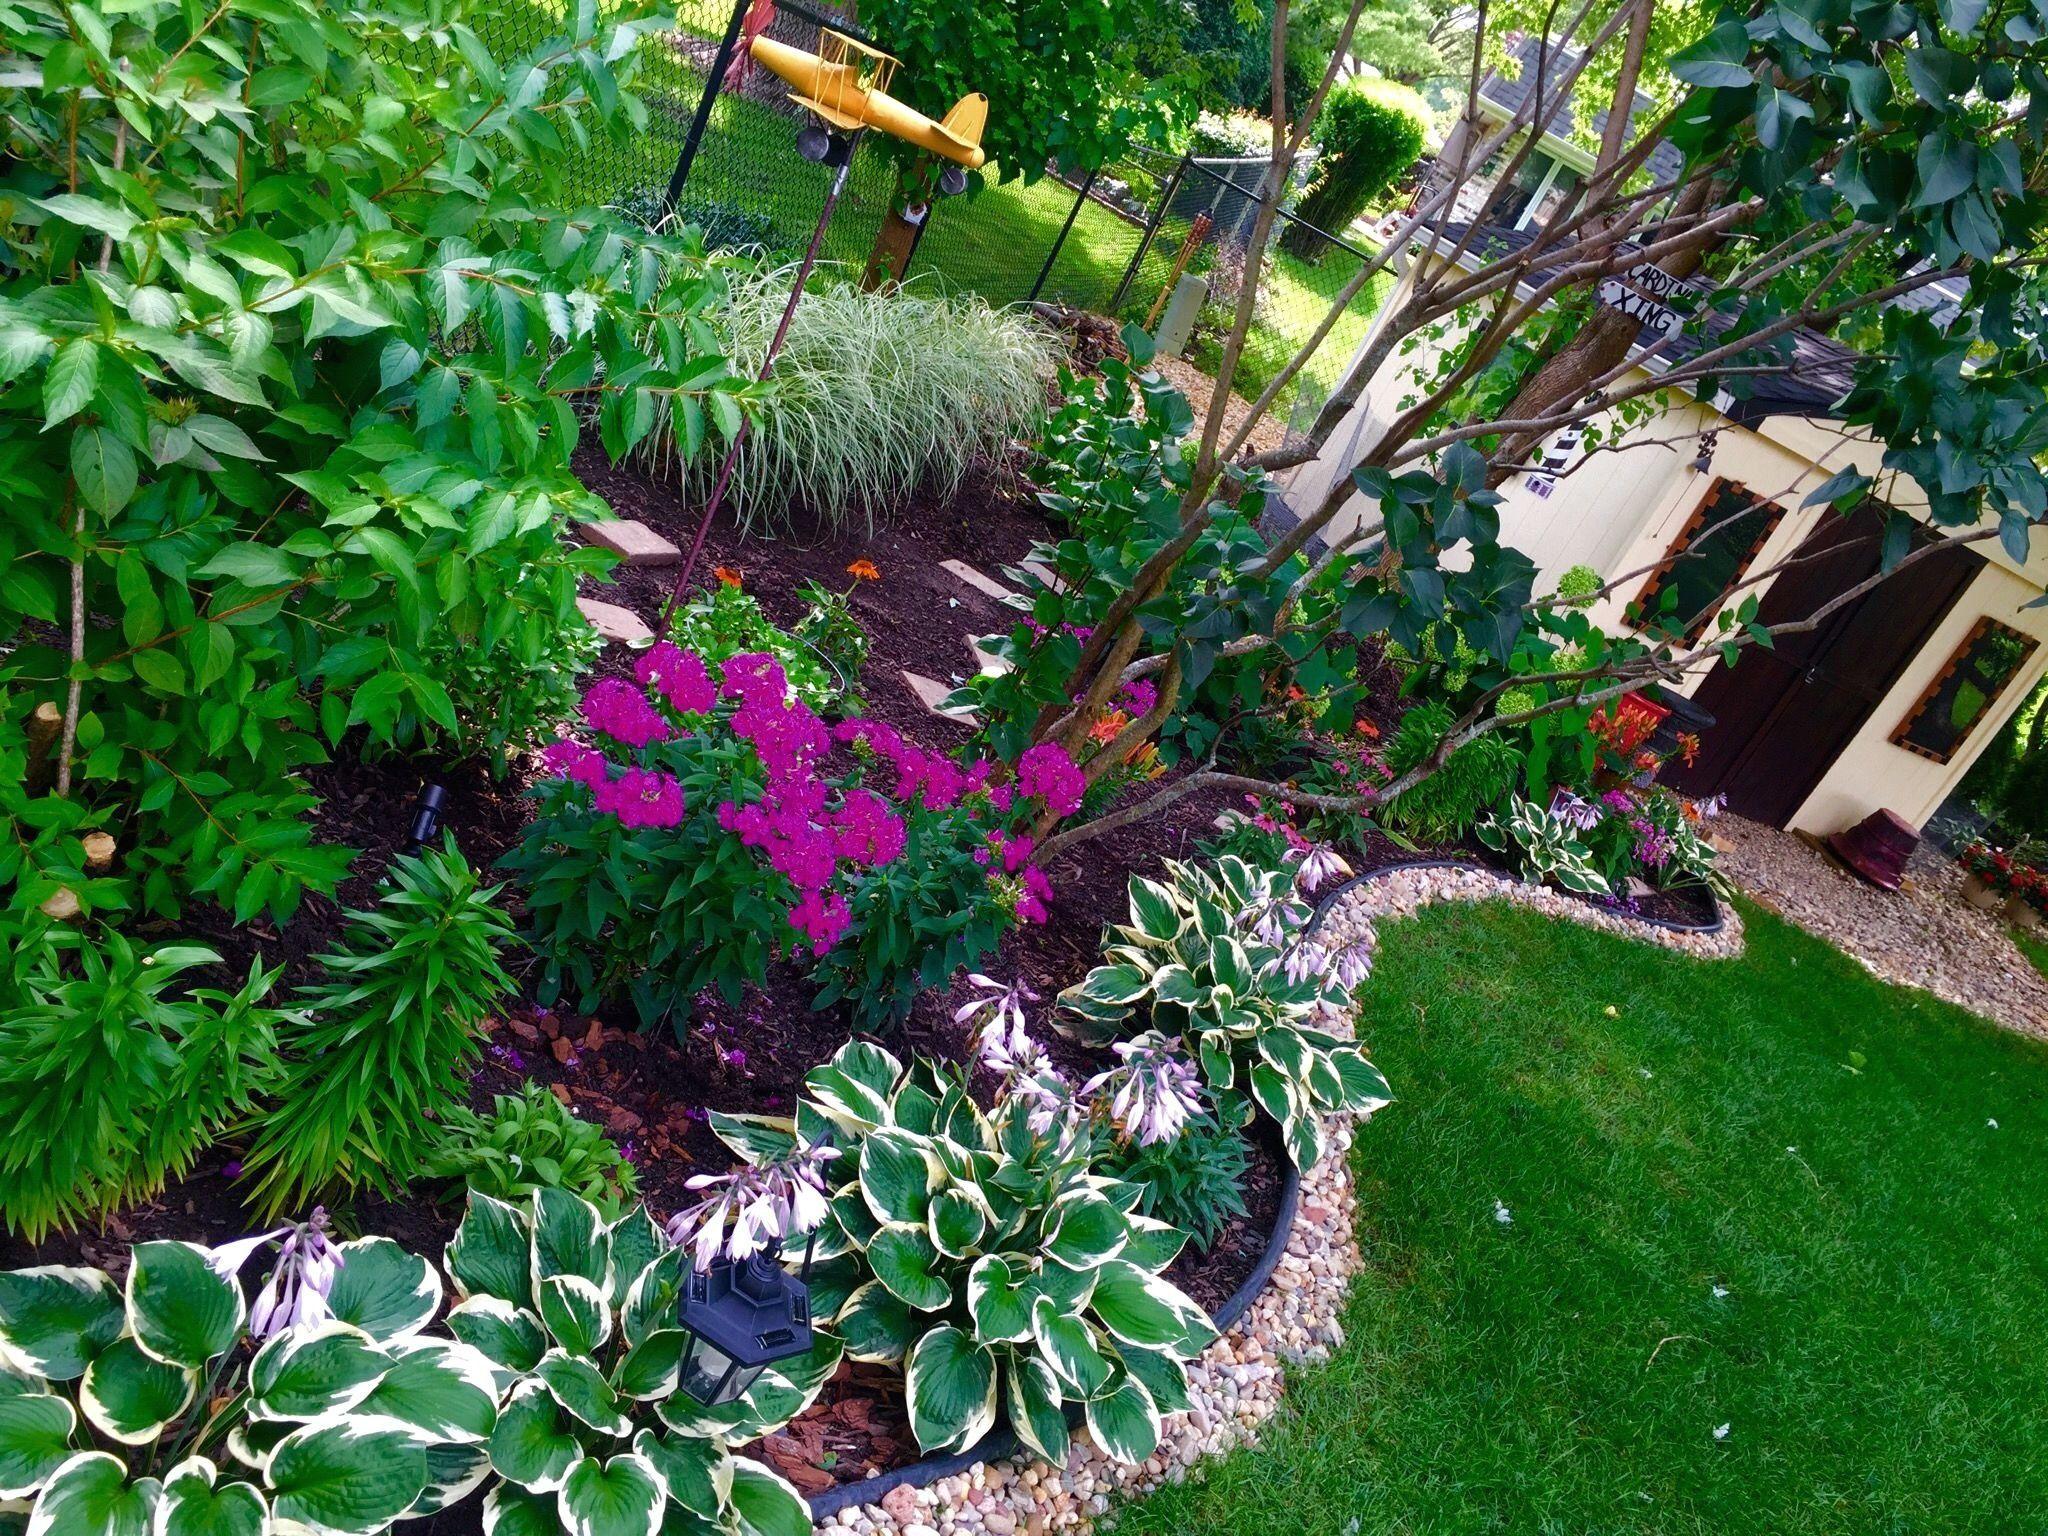 3edf7e6c3993be9c2c91a0262937b8bd - What Is Zone 5b For Gardening